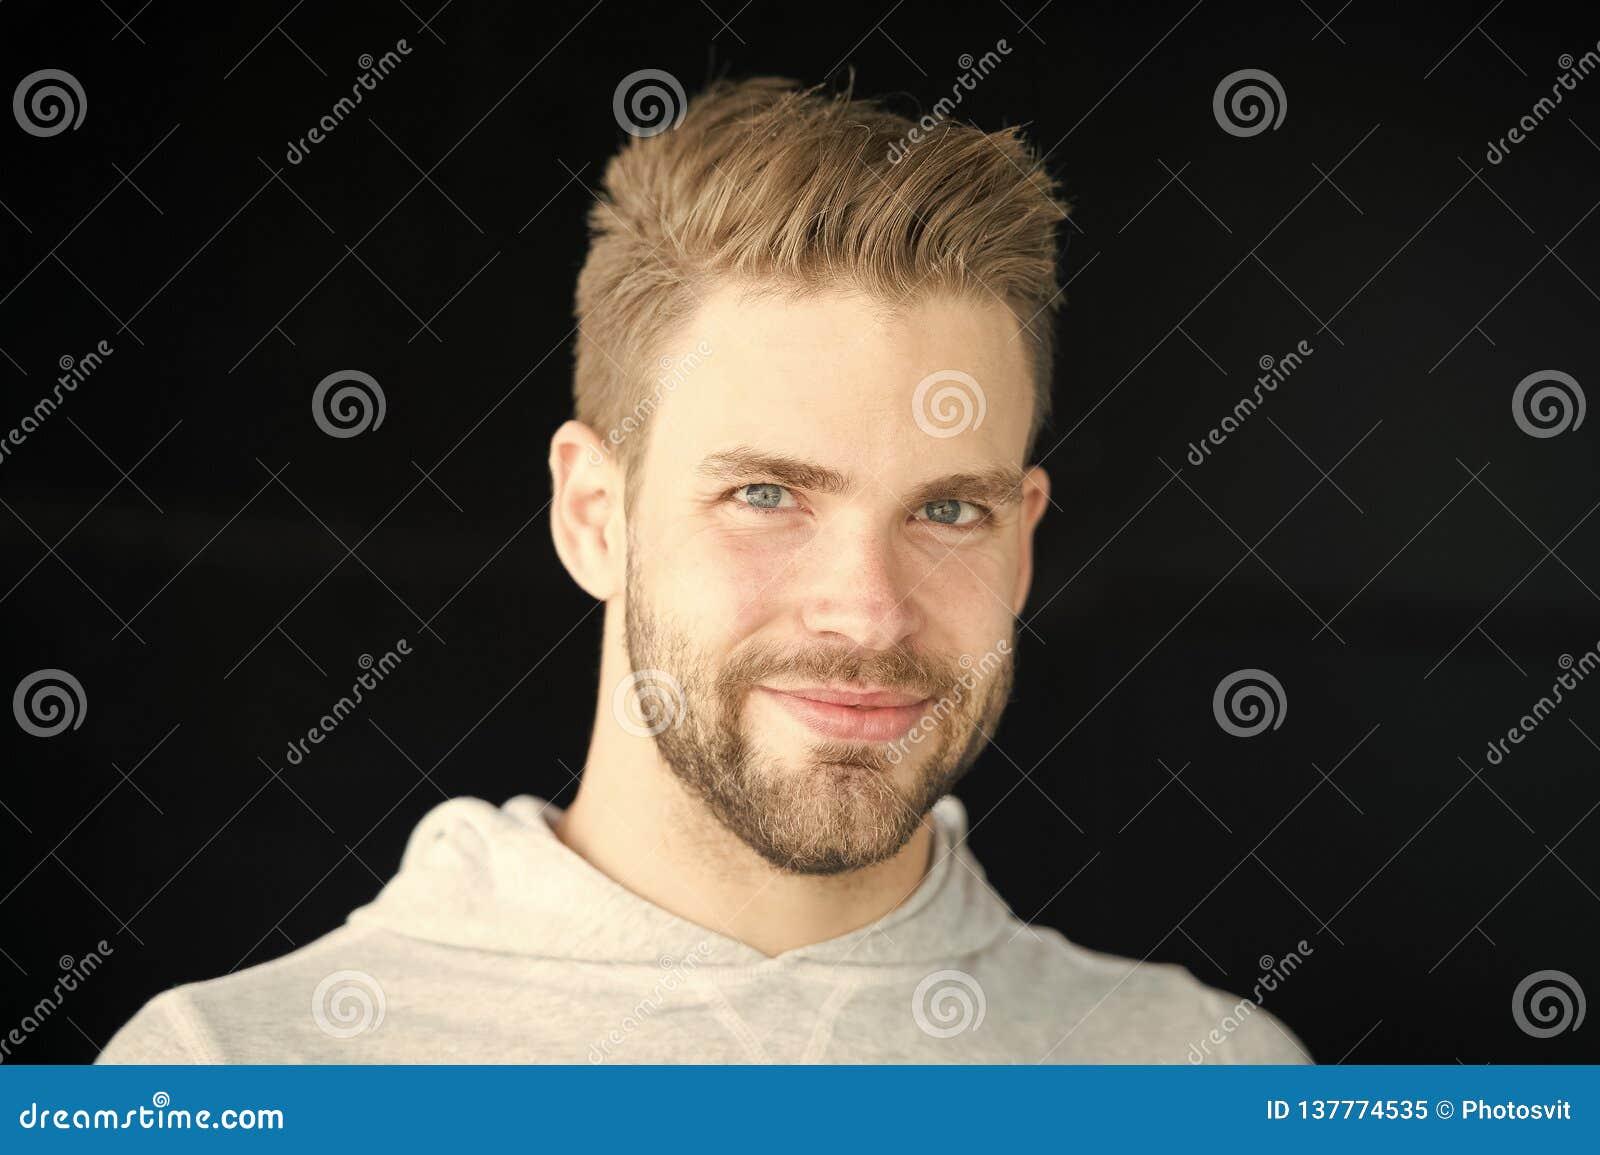 Dating metrosexual man